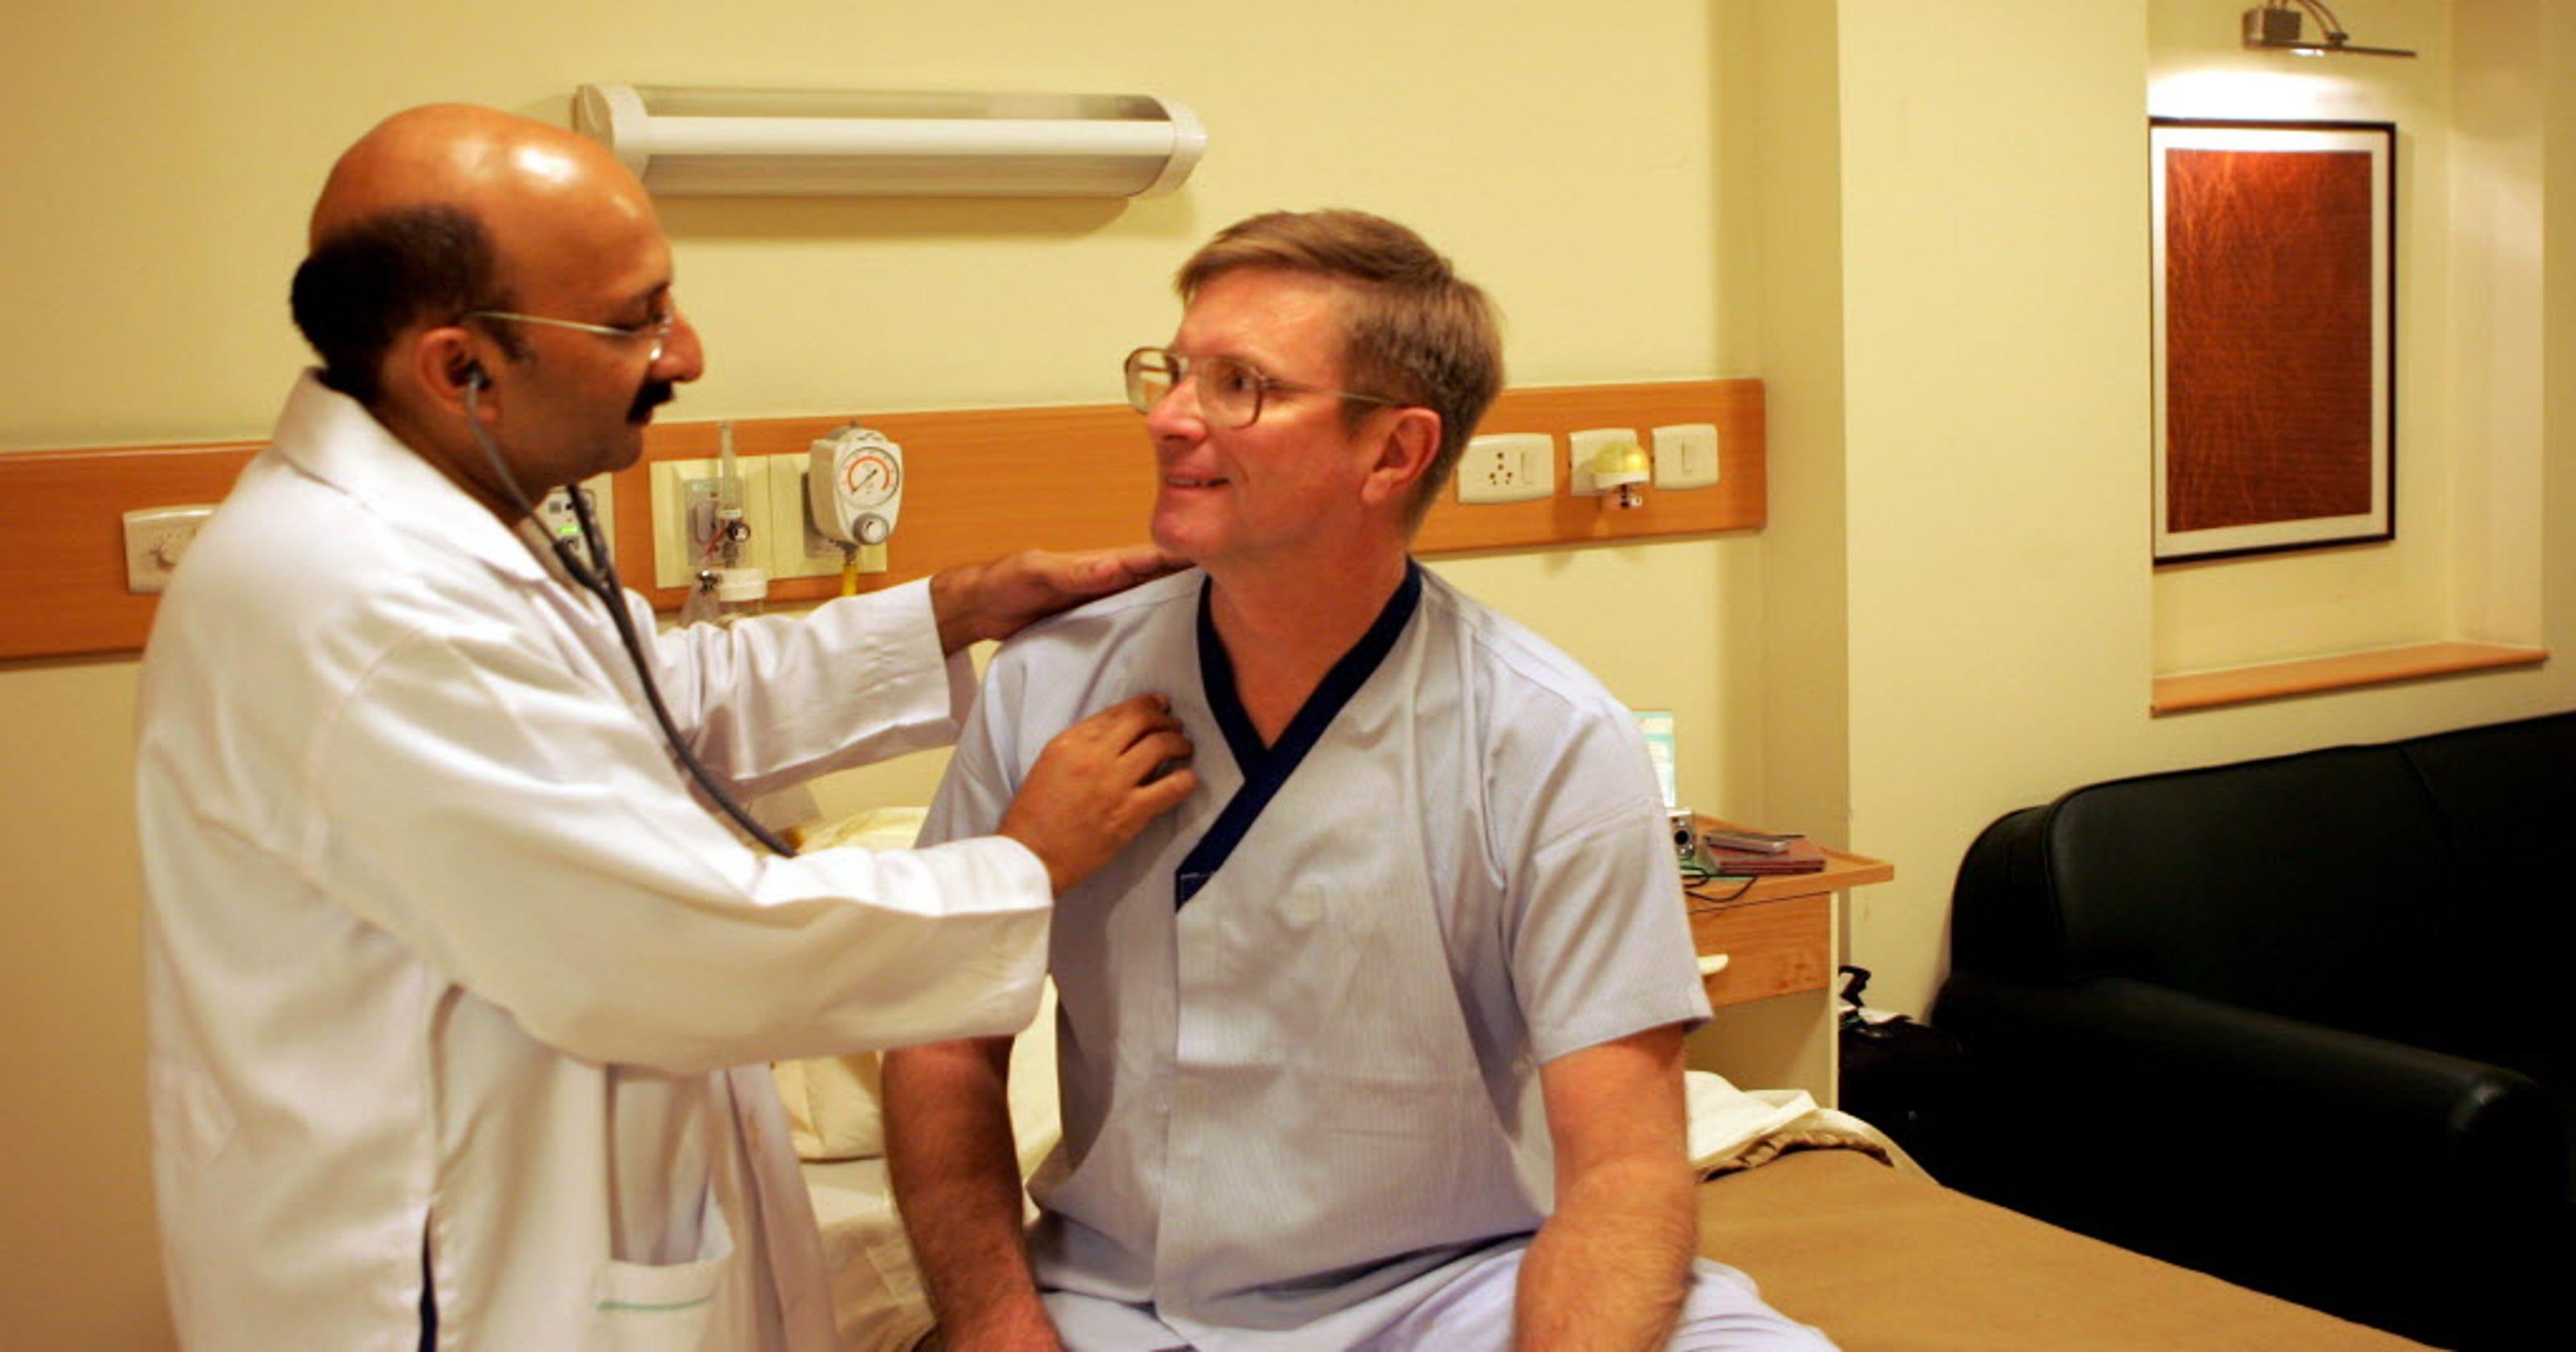 U S  health care needs a wakeup call from India: Column